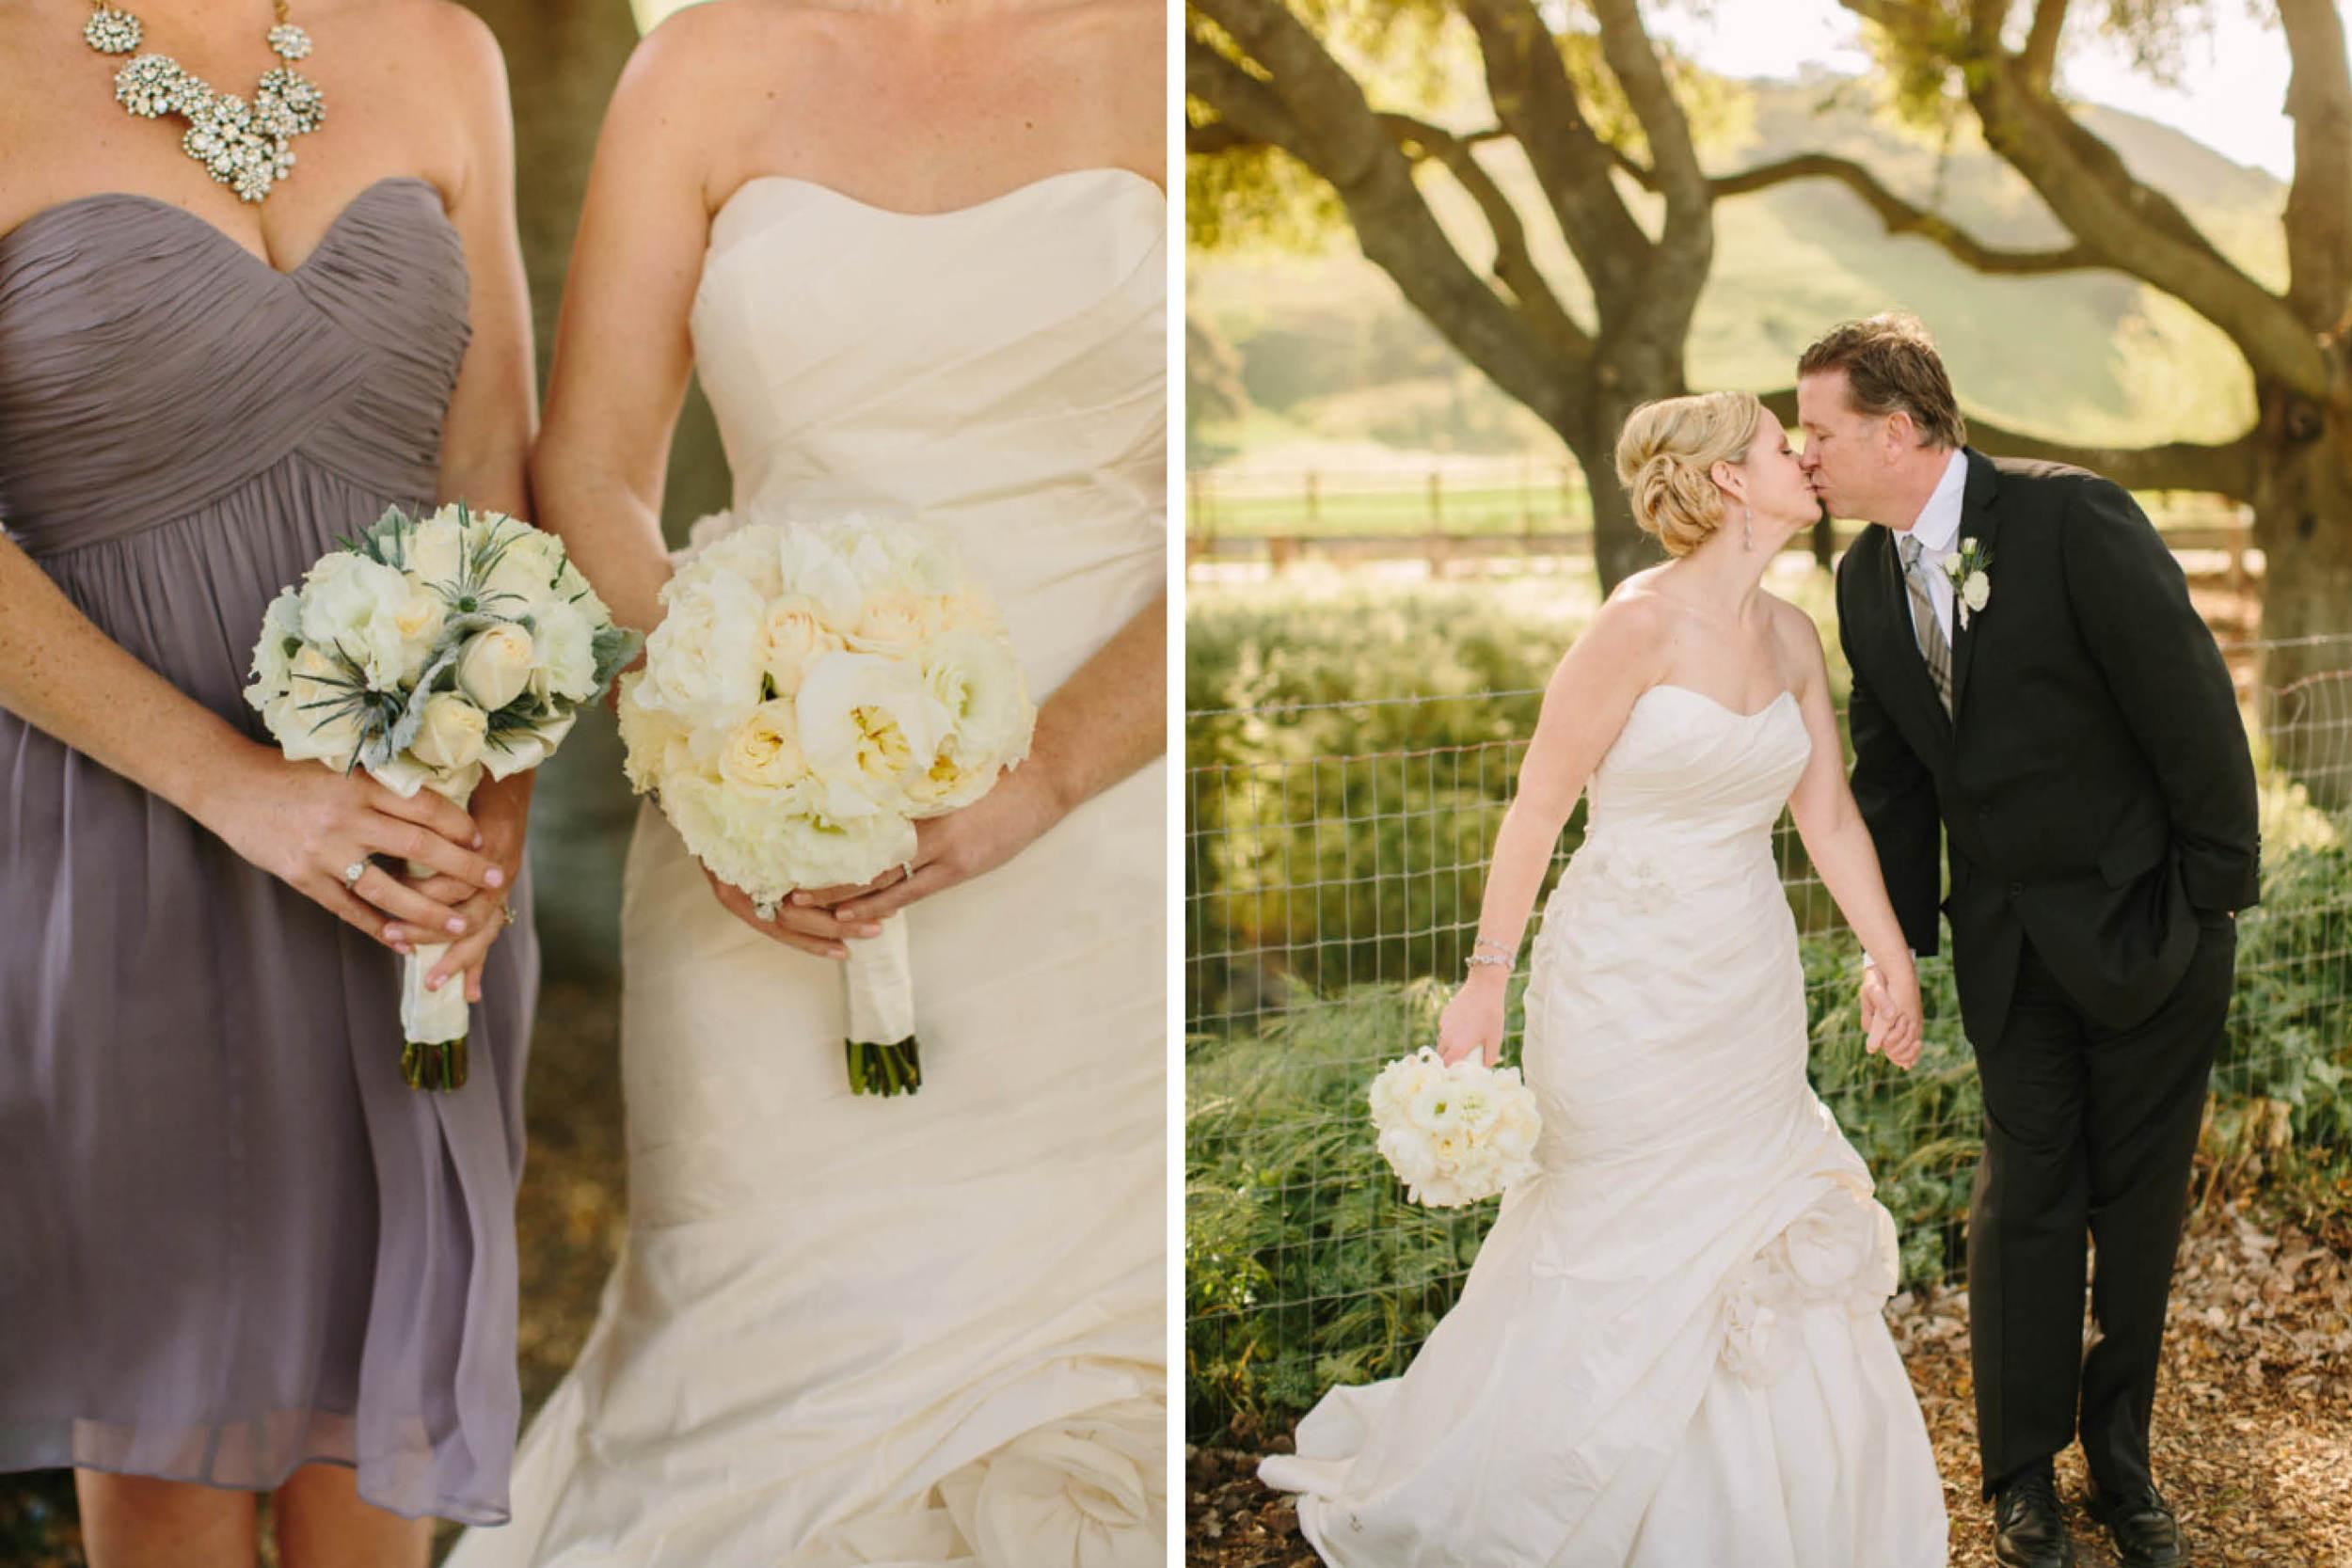 alegria-by-design-tres-hermanas-winery-vineyard-wedding-planner-coordinator-santa-barbara-ynez-maria (5).jpg